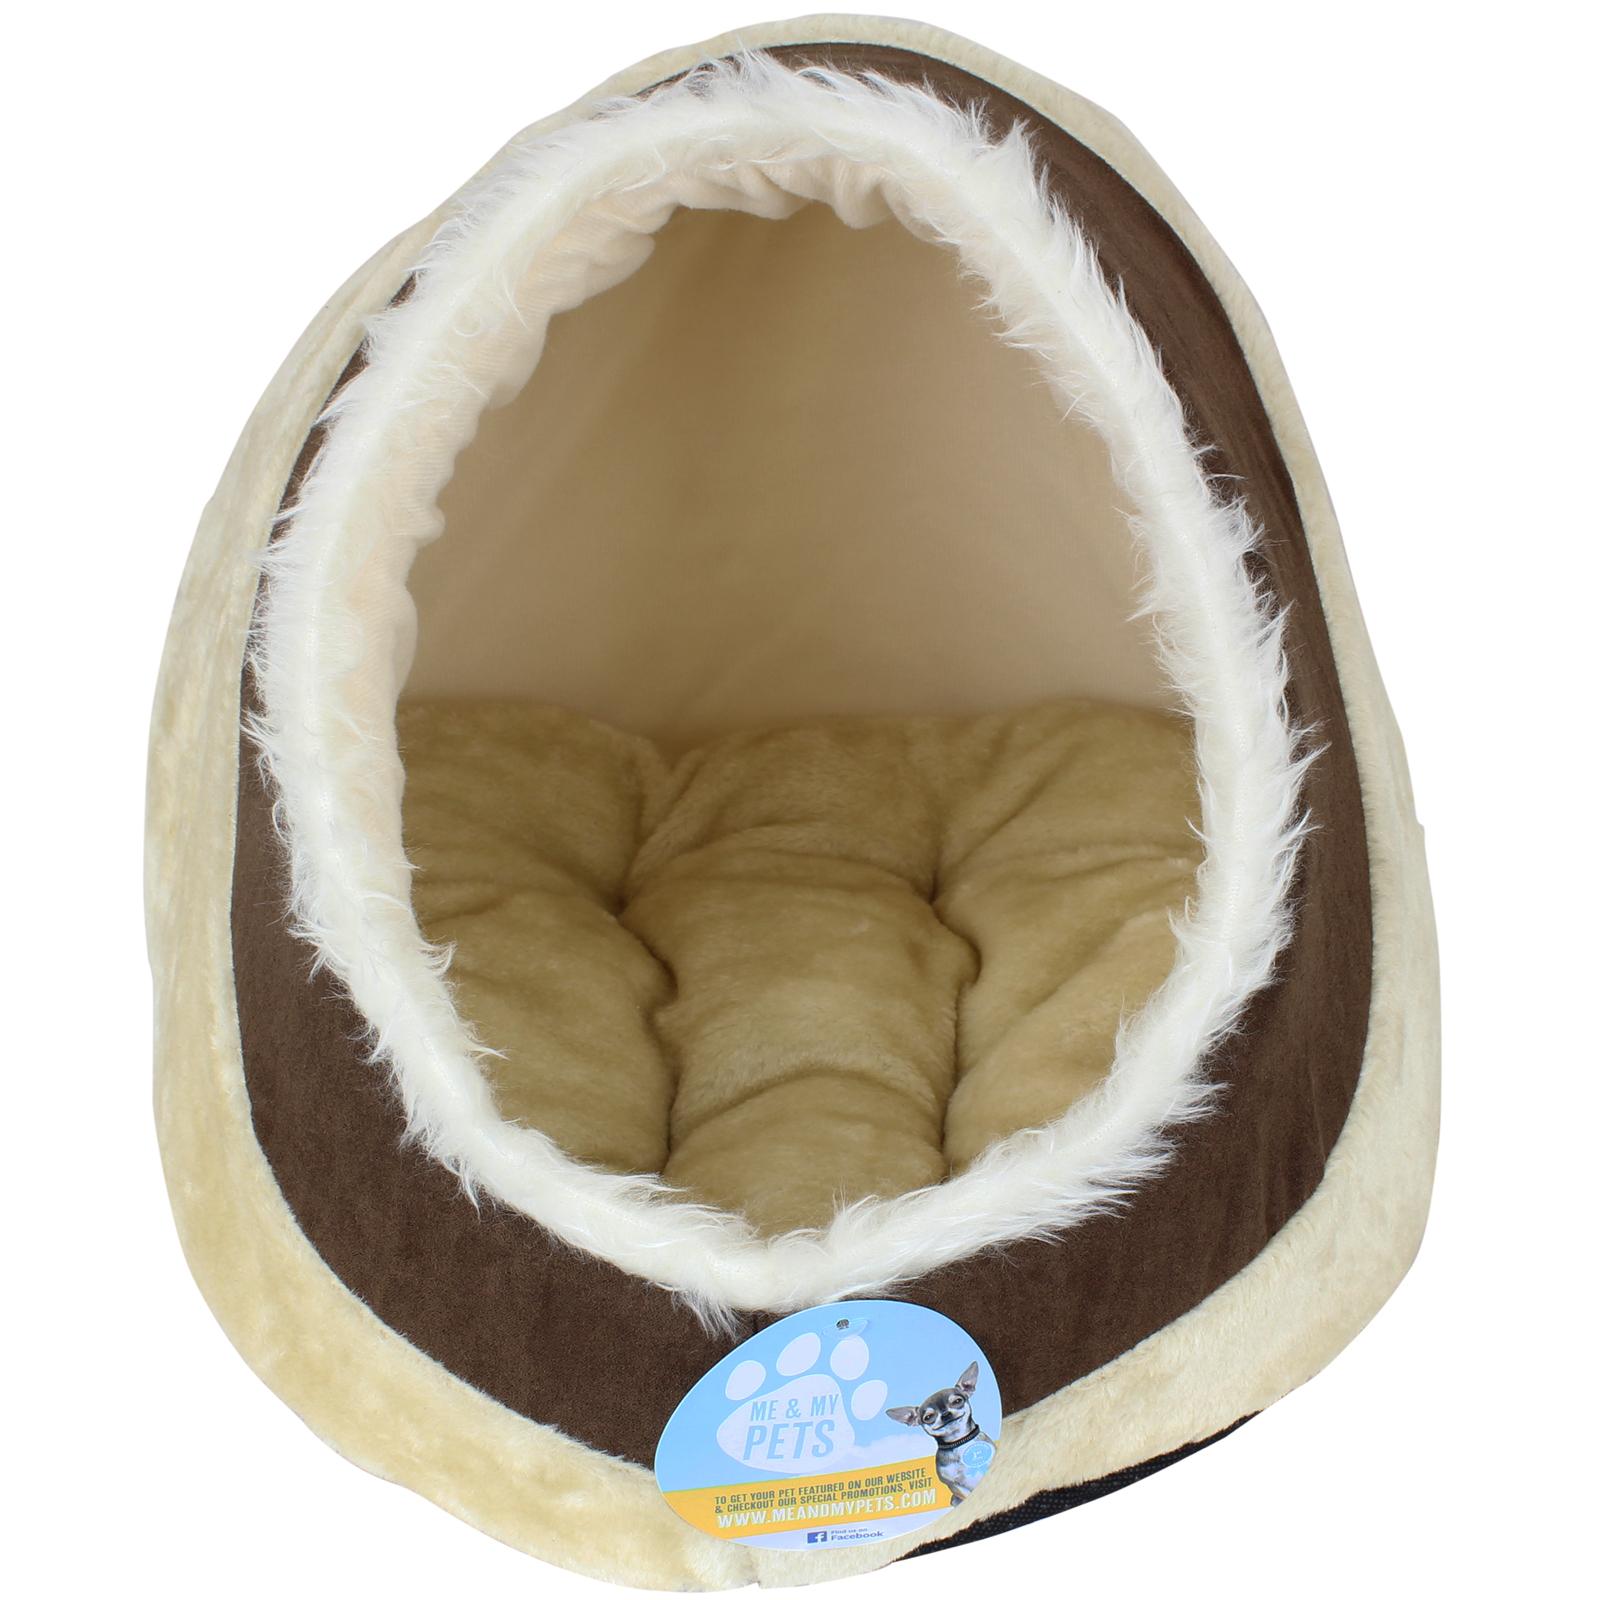 Me Amp My Soft Plush Igloo Pet Bed Cat Kitten Dog Puppy Warm